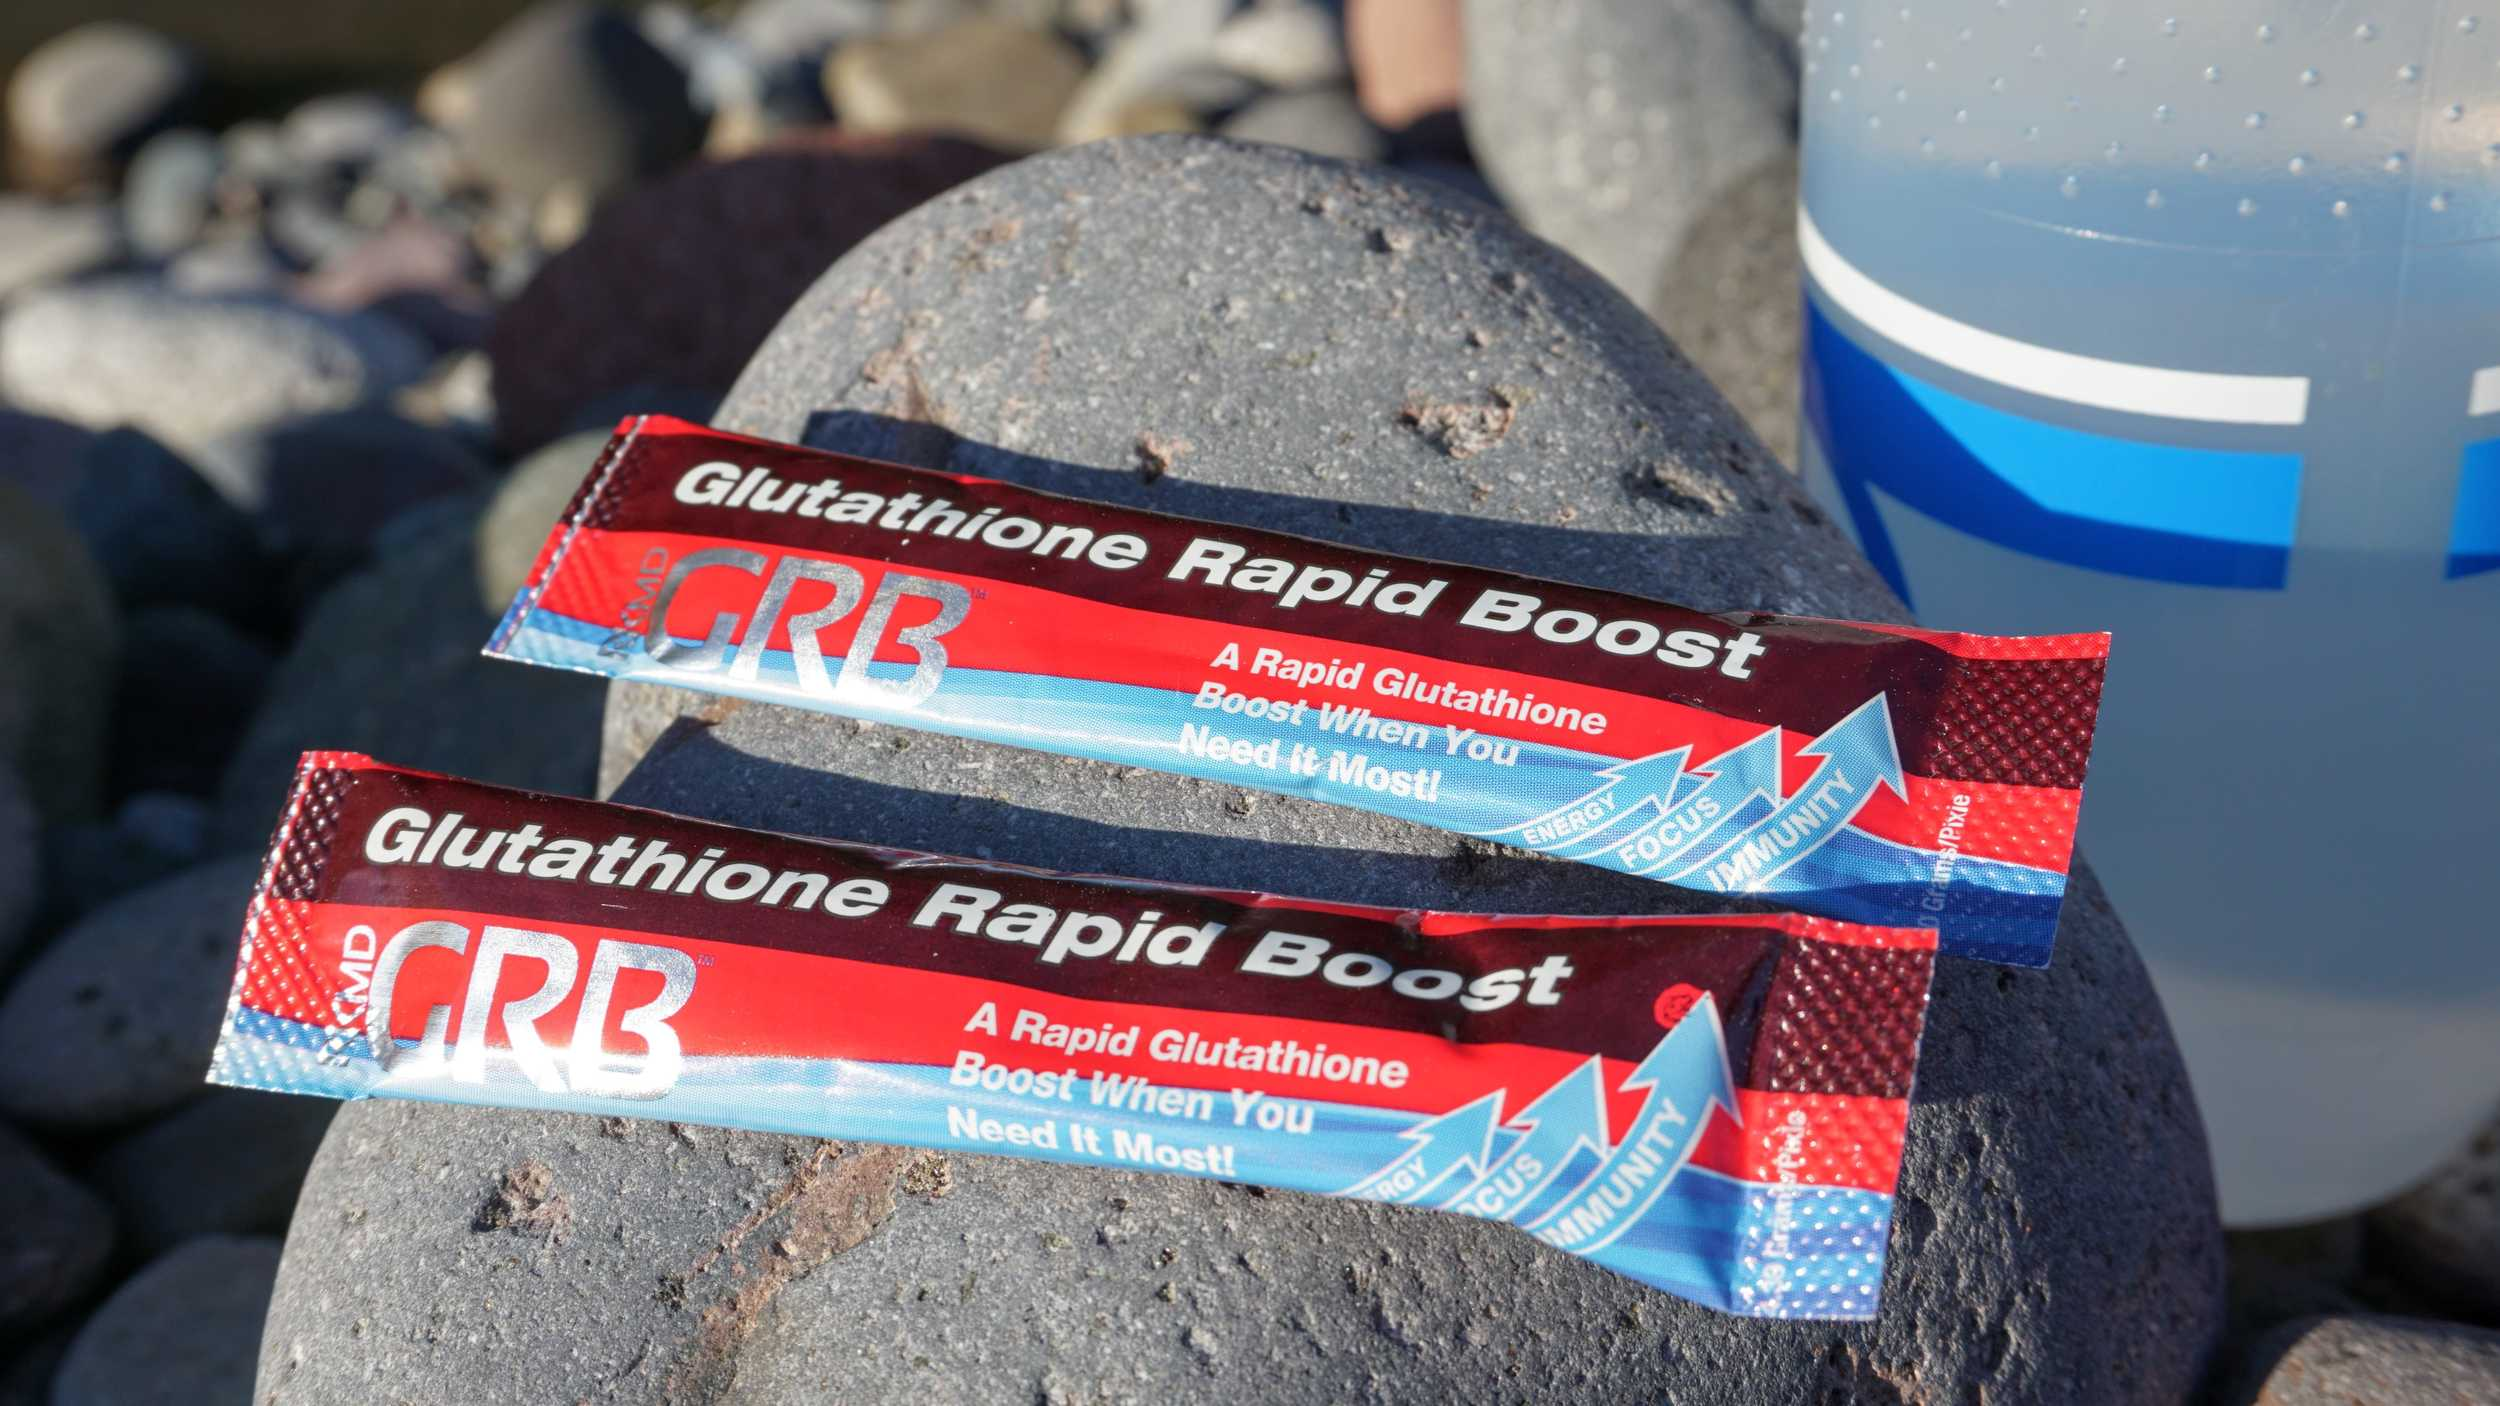 Blutathione Rapid Boost - Pacific North Wanderers.jpg